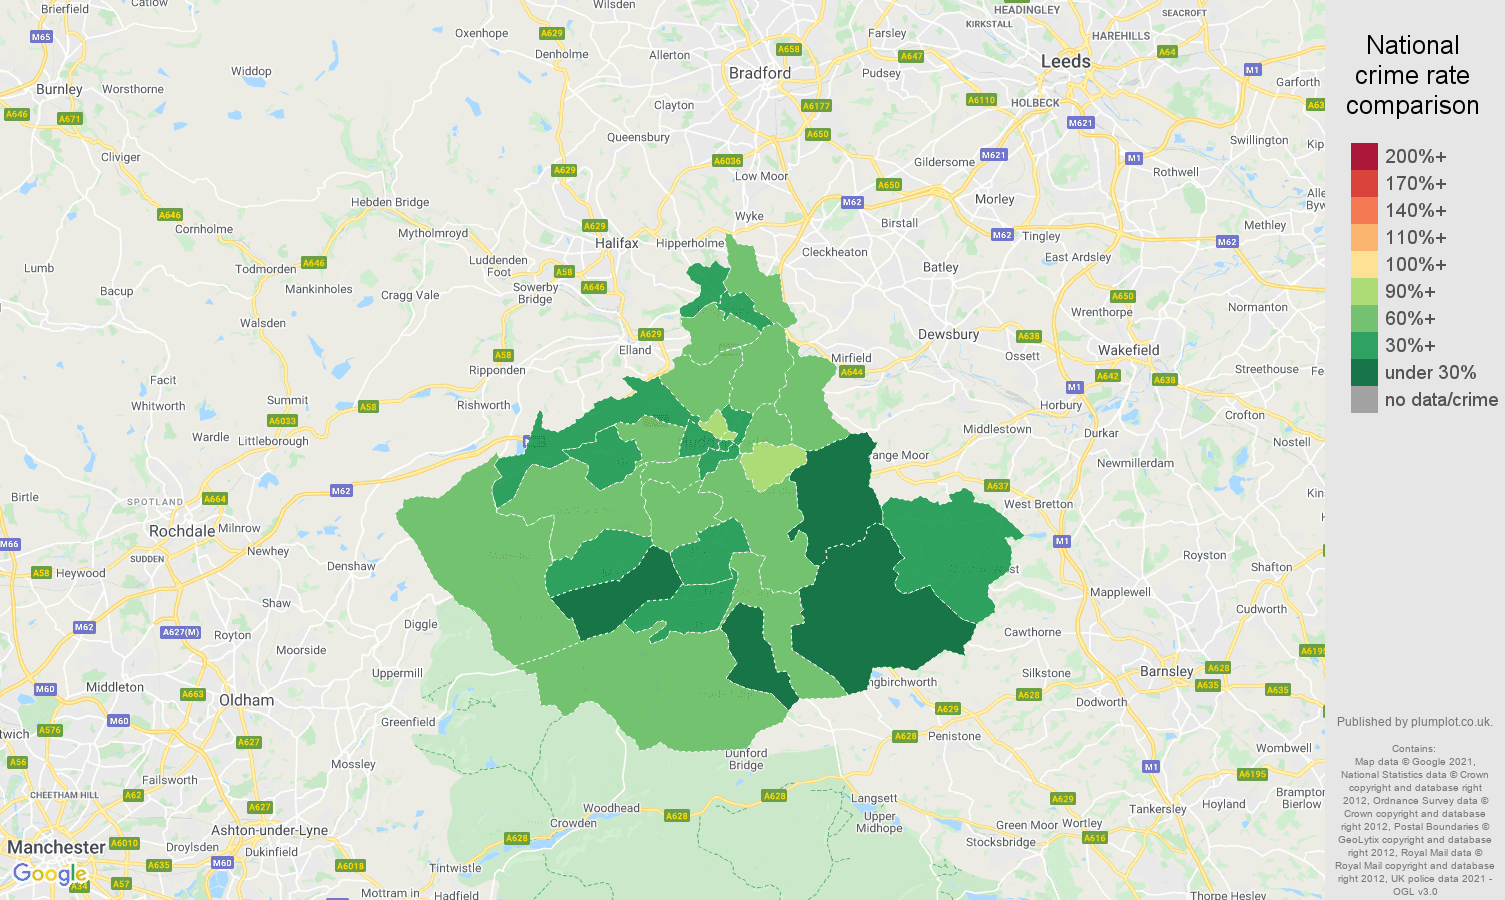 Huddersfield antisocial behaviour crime rate comparison map